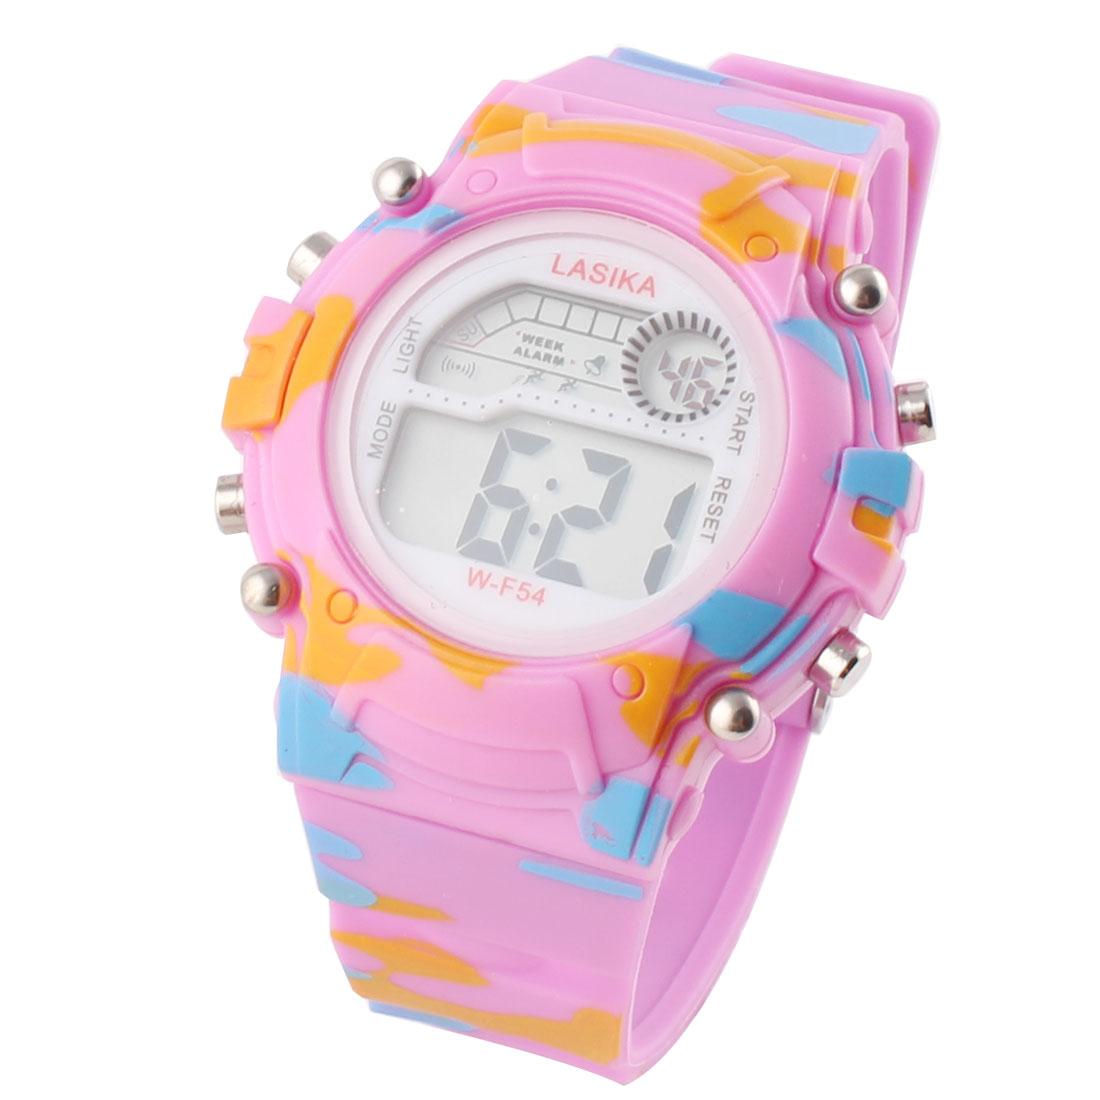 Woman Plastic Round Dial Adjustable Watchband Sports Wrist Watch Stopwatch Fuchsia